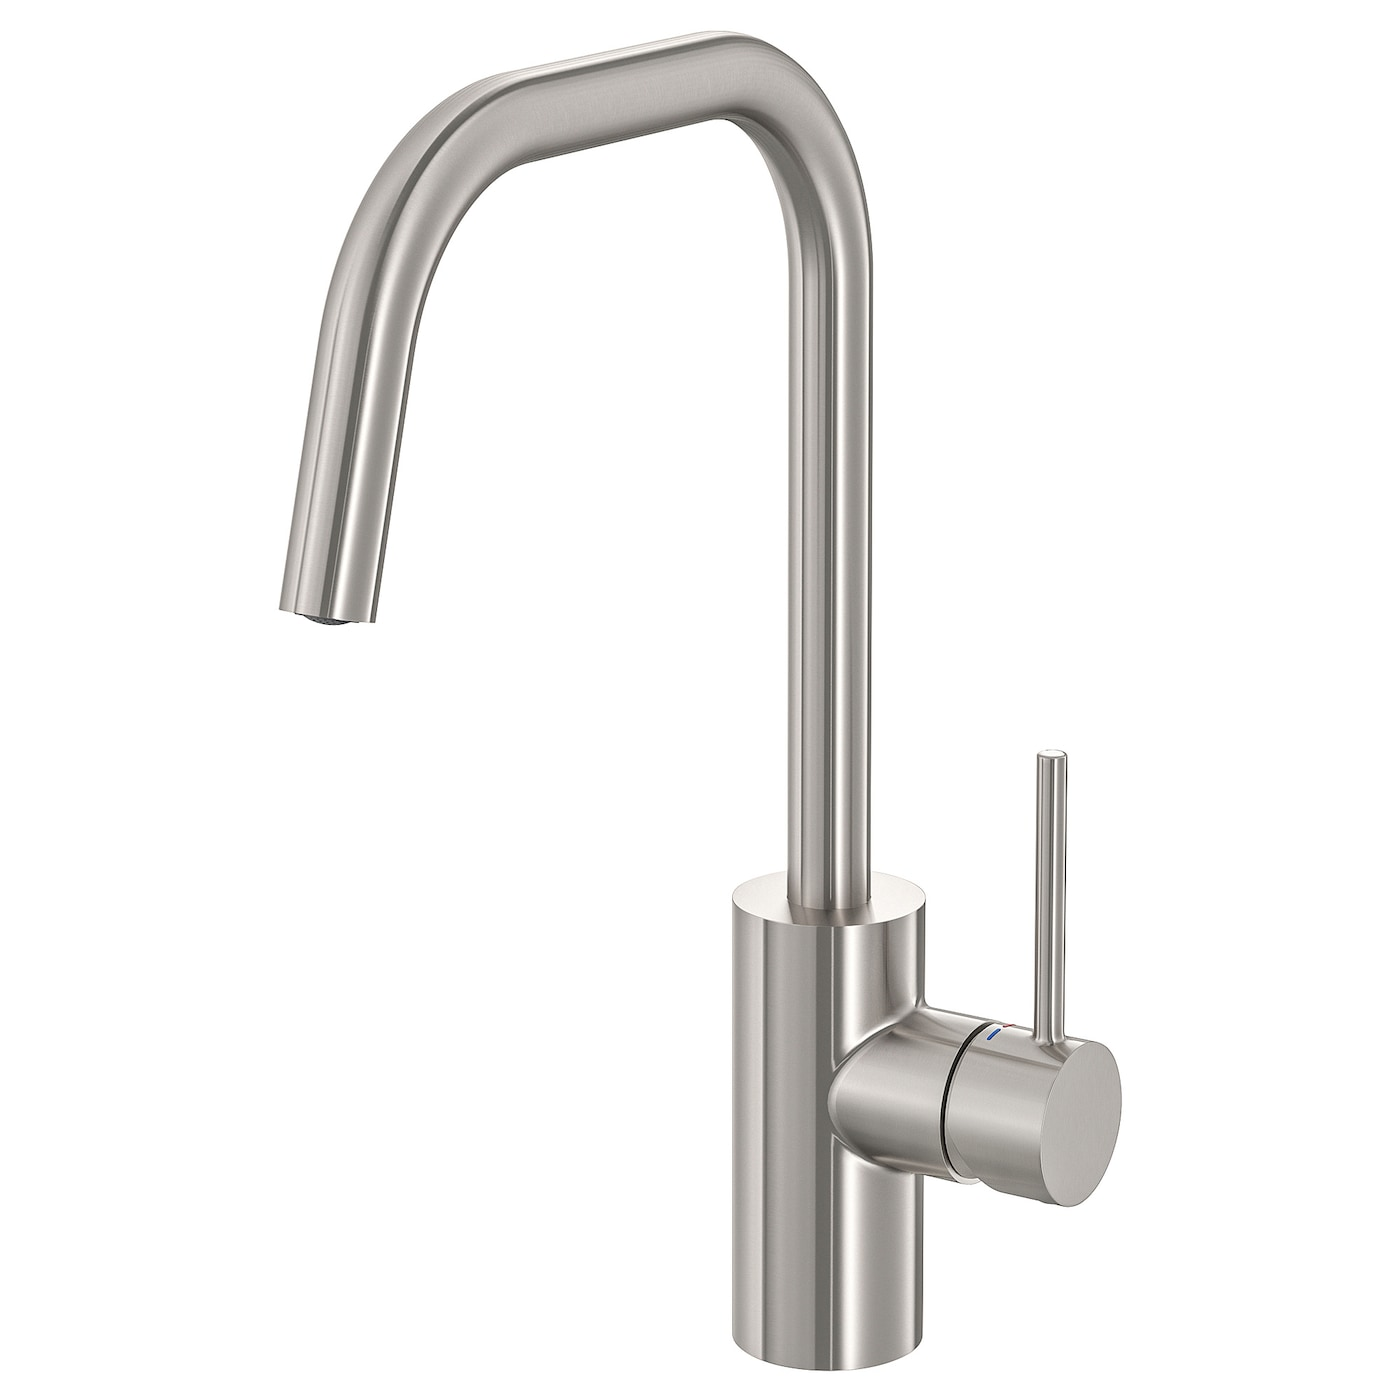 ÄLMAREN Kitchen faucet - stainless steel color